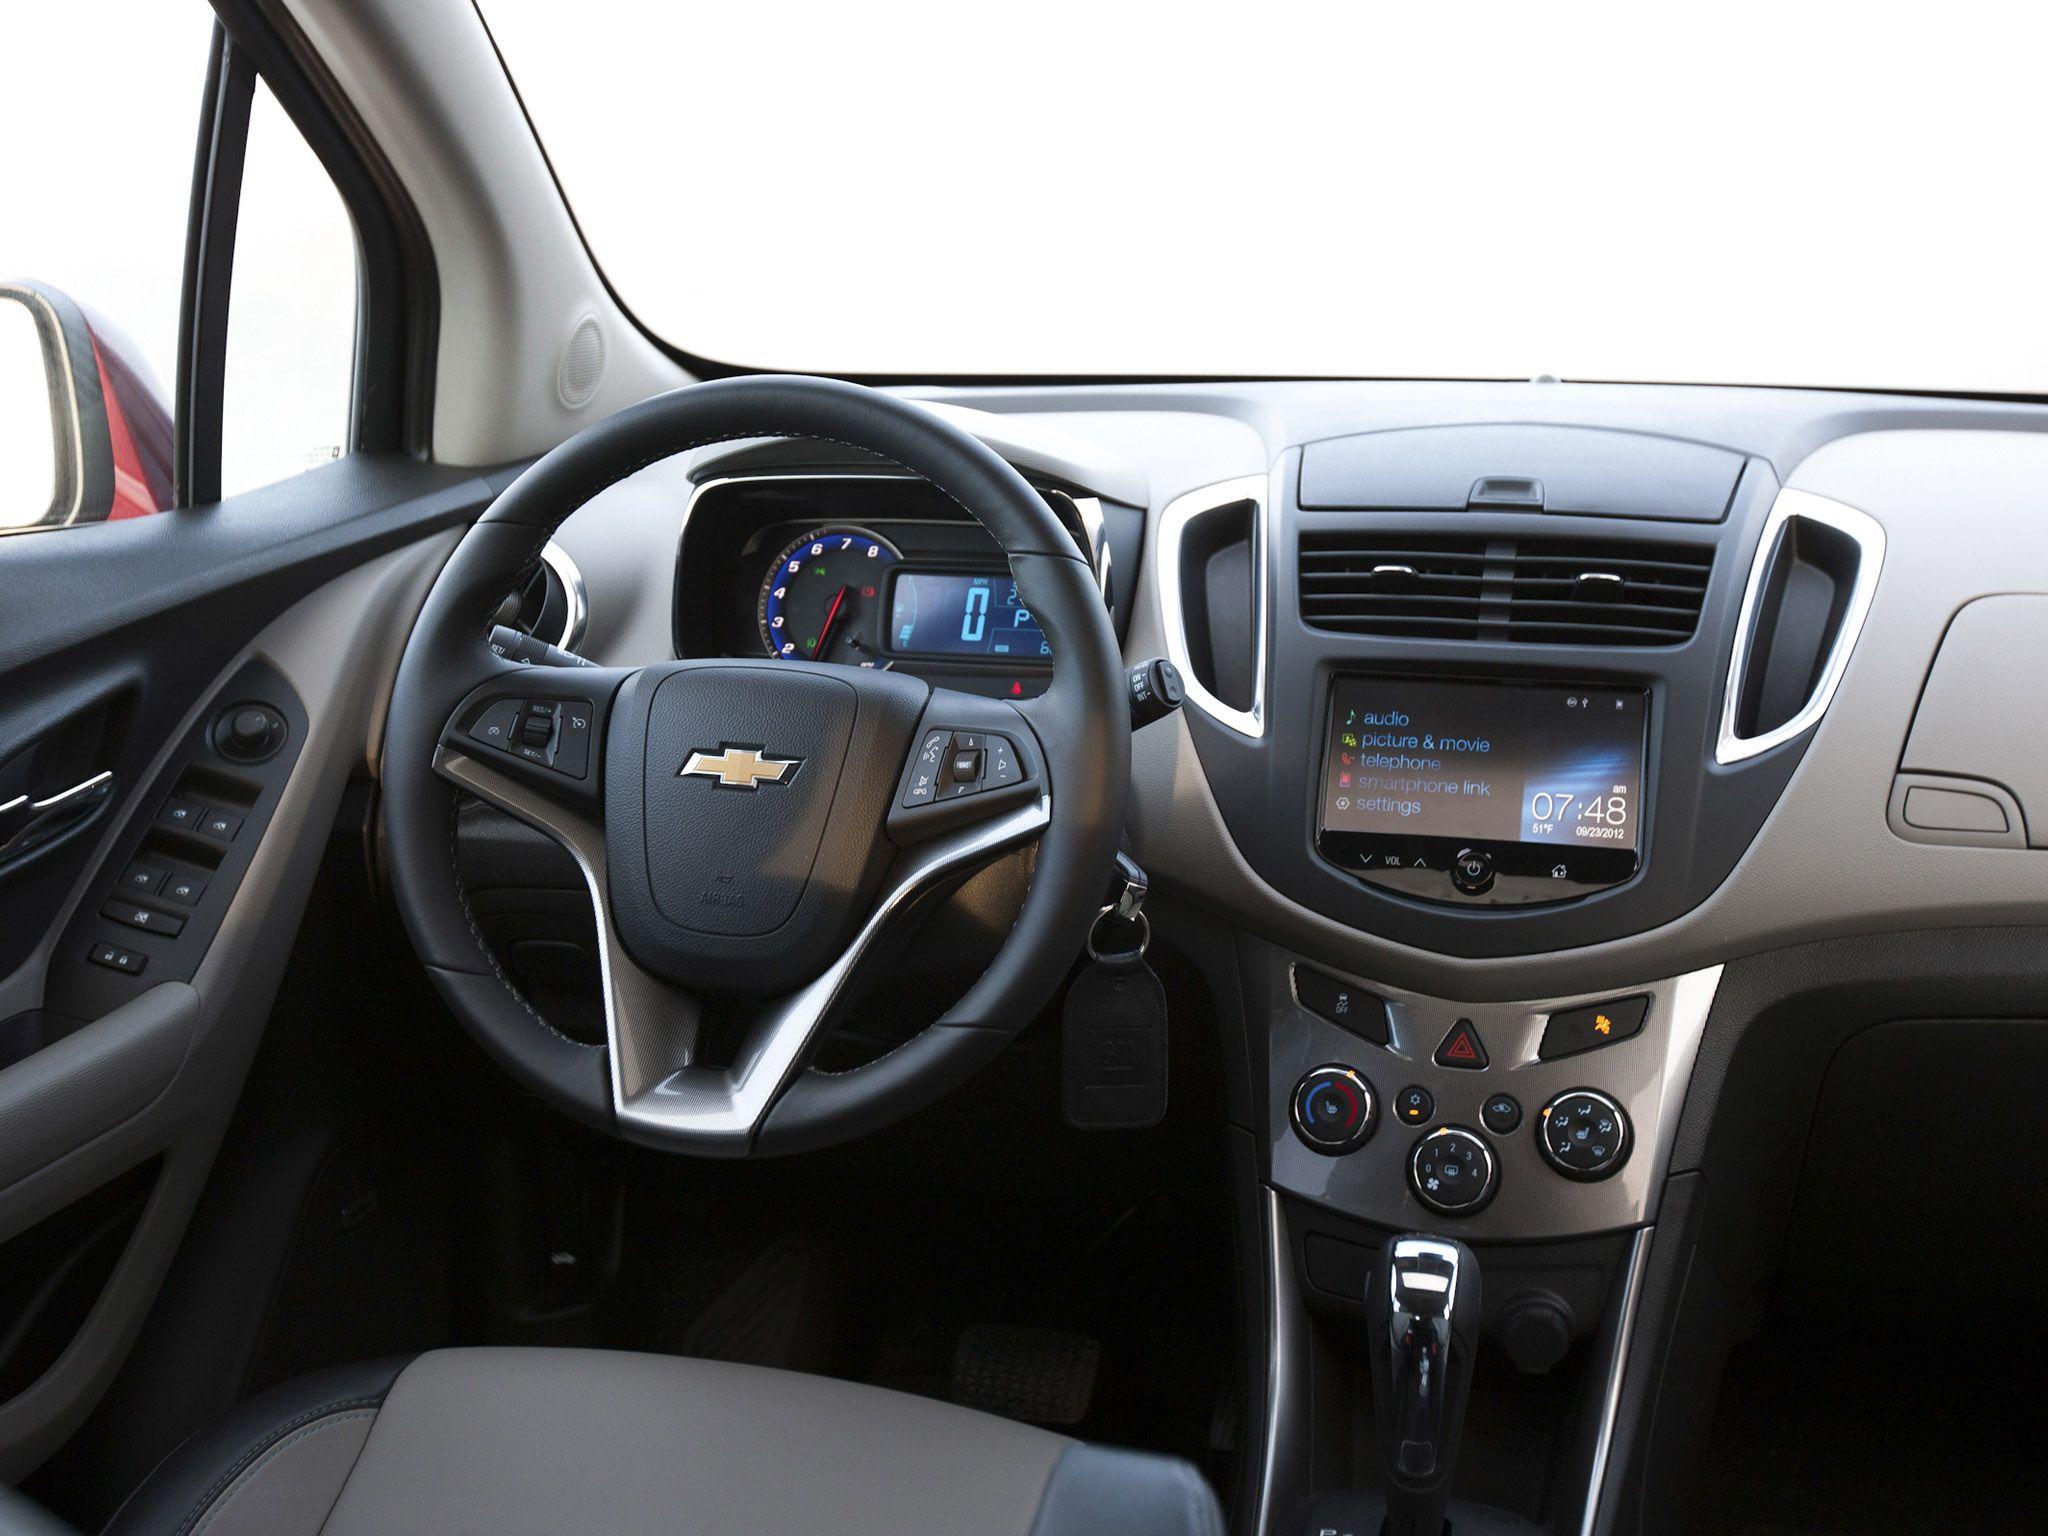 2014 Chevrolet Trax Crossover Red Car Interior Chevrolet Trax